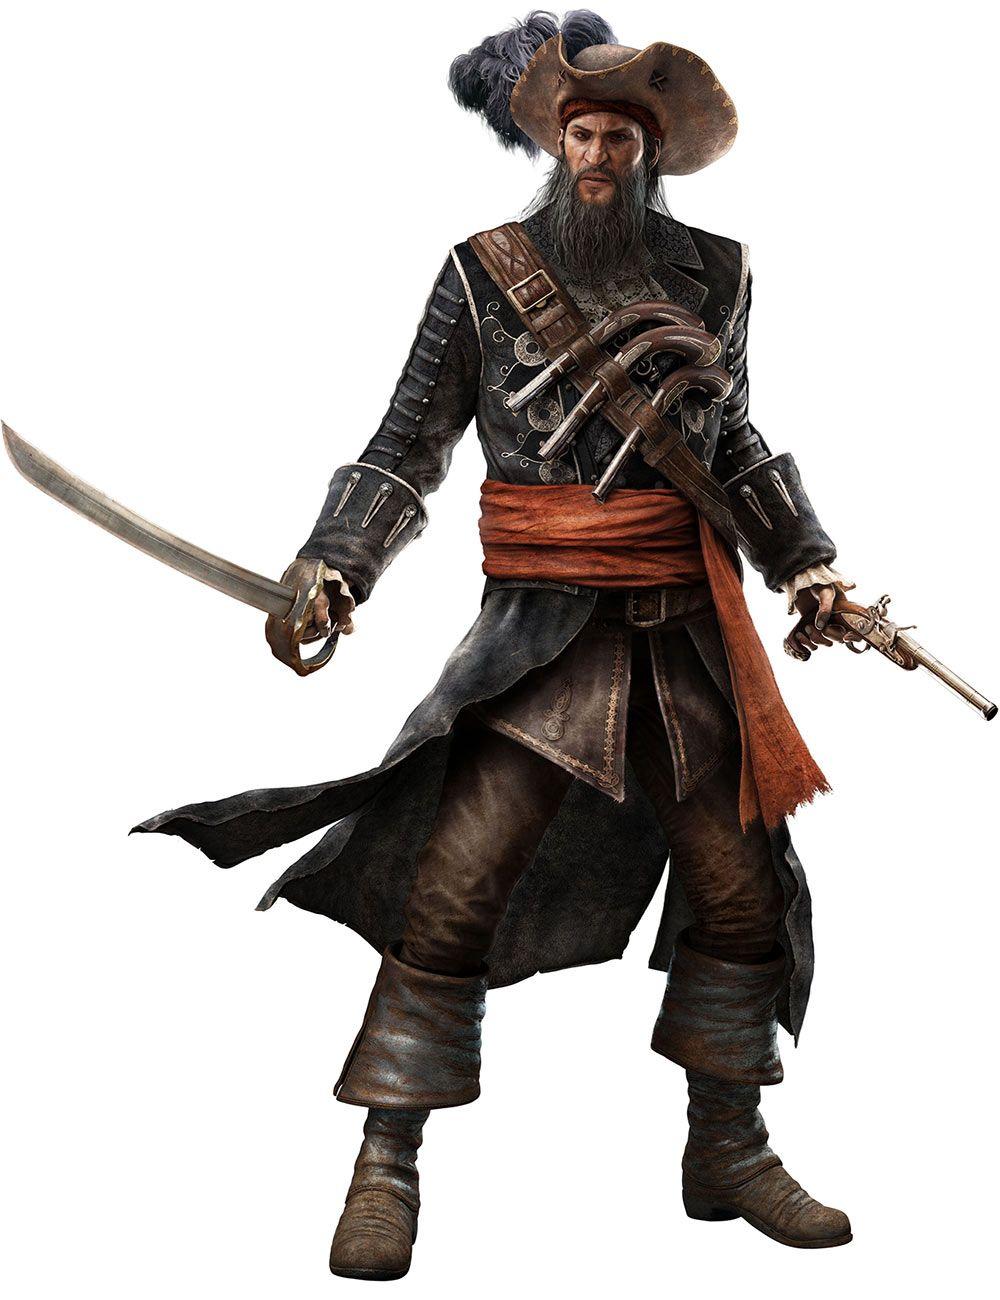 Edward Teach Blackbeard Characters Art Assassin S Creed Iv Black Flag Assassins Creed Black Flag Assassins Creed 4 Blackbeard